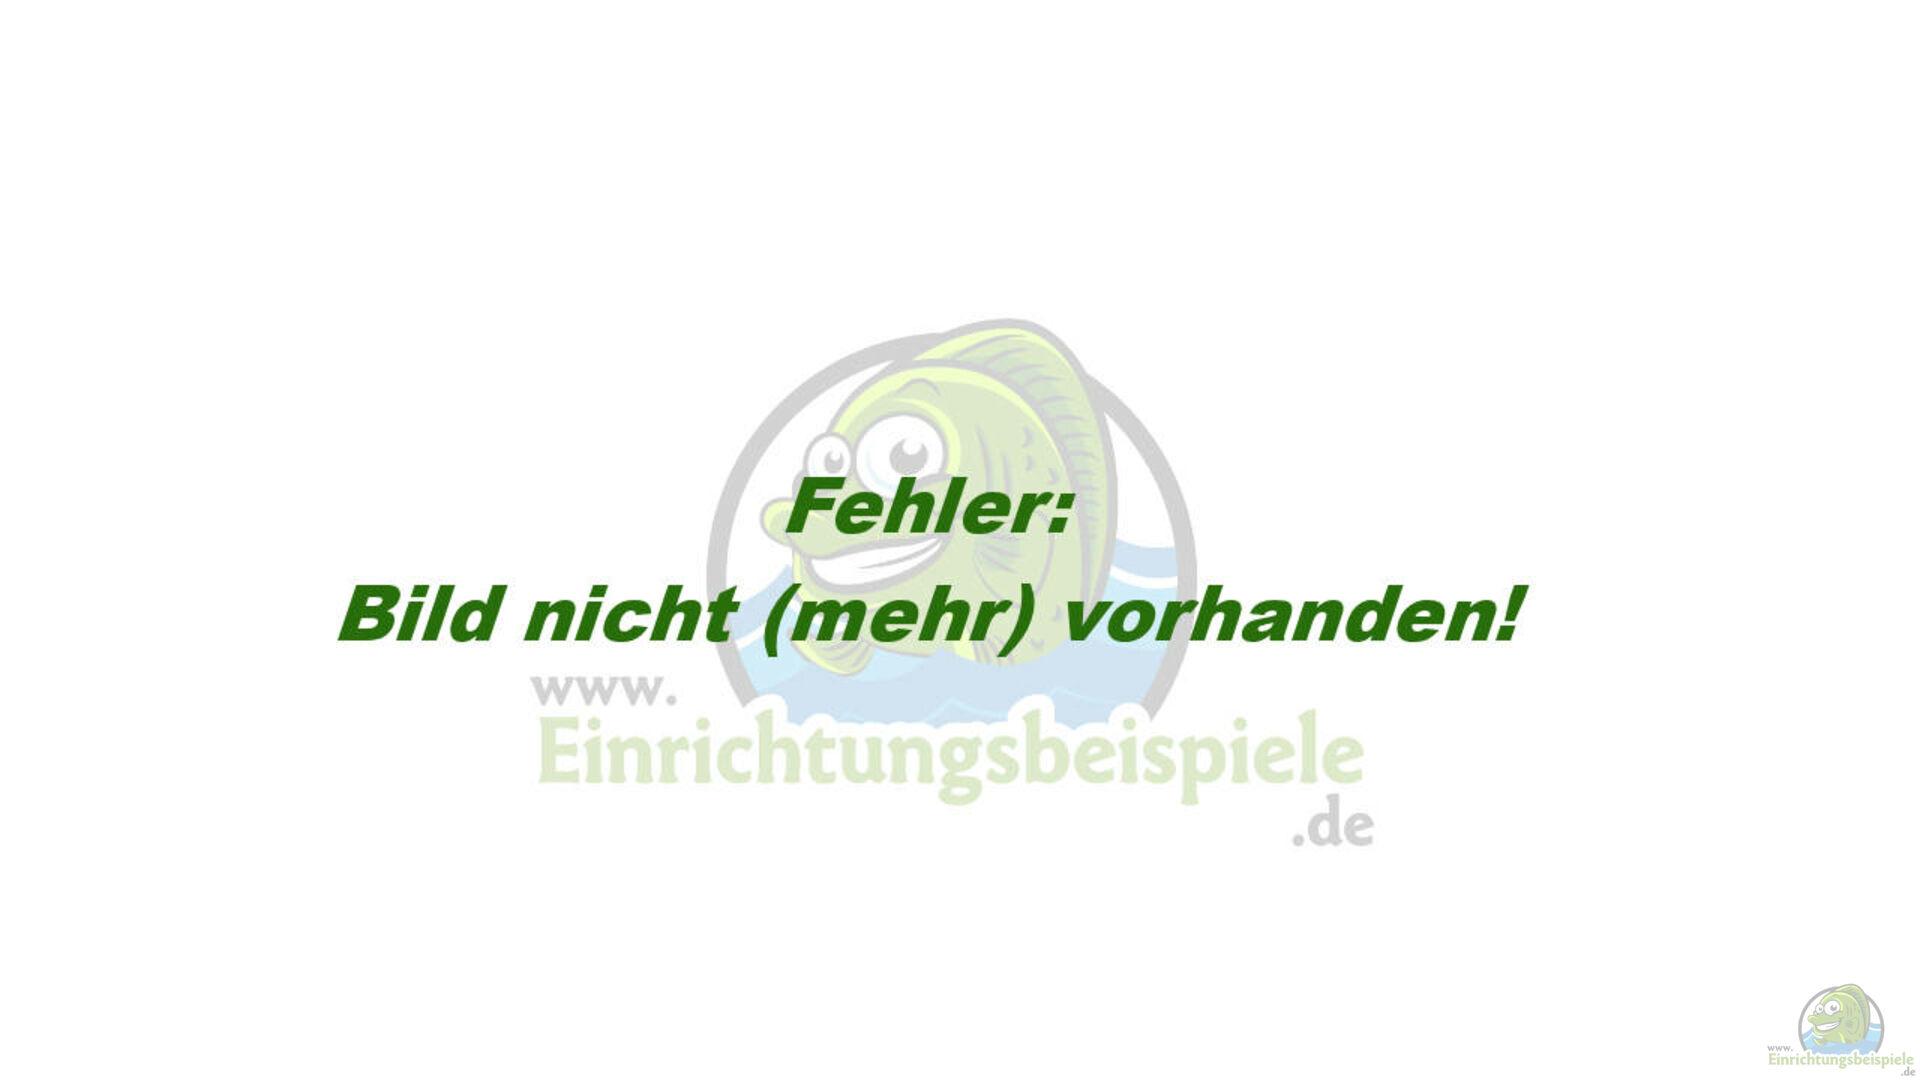 aquarium von dennis r 18908 malawi predator bay. Black Bedroom Furniture Sets. Home Design Ideas